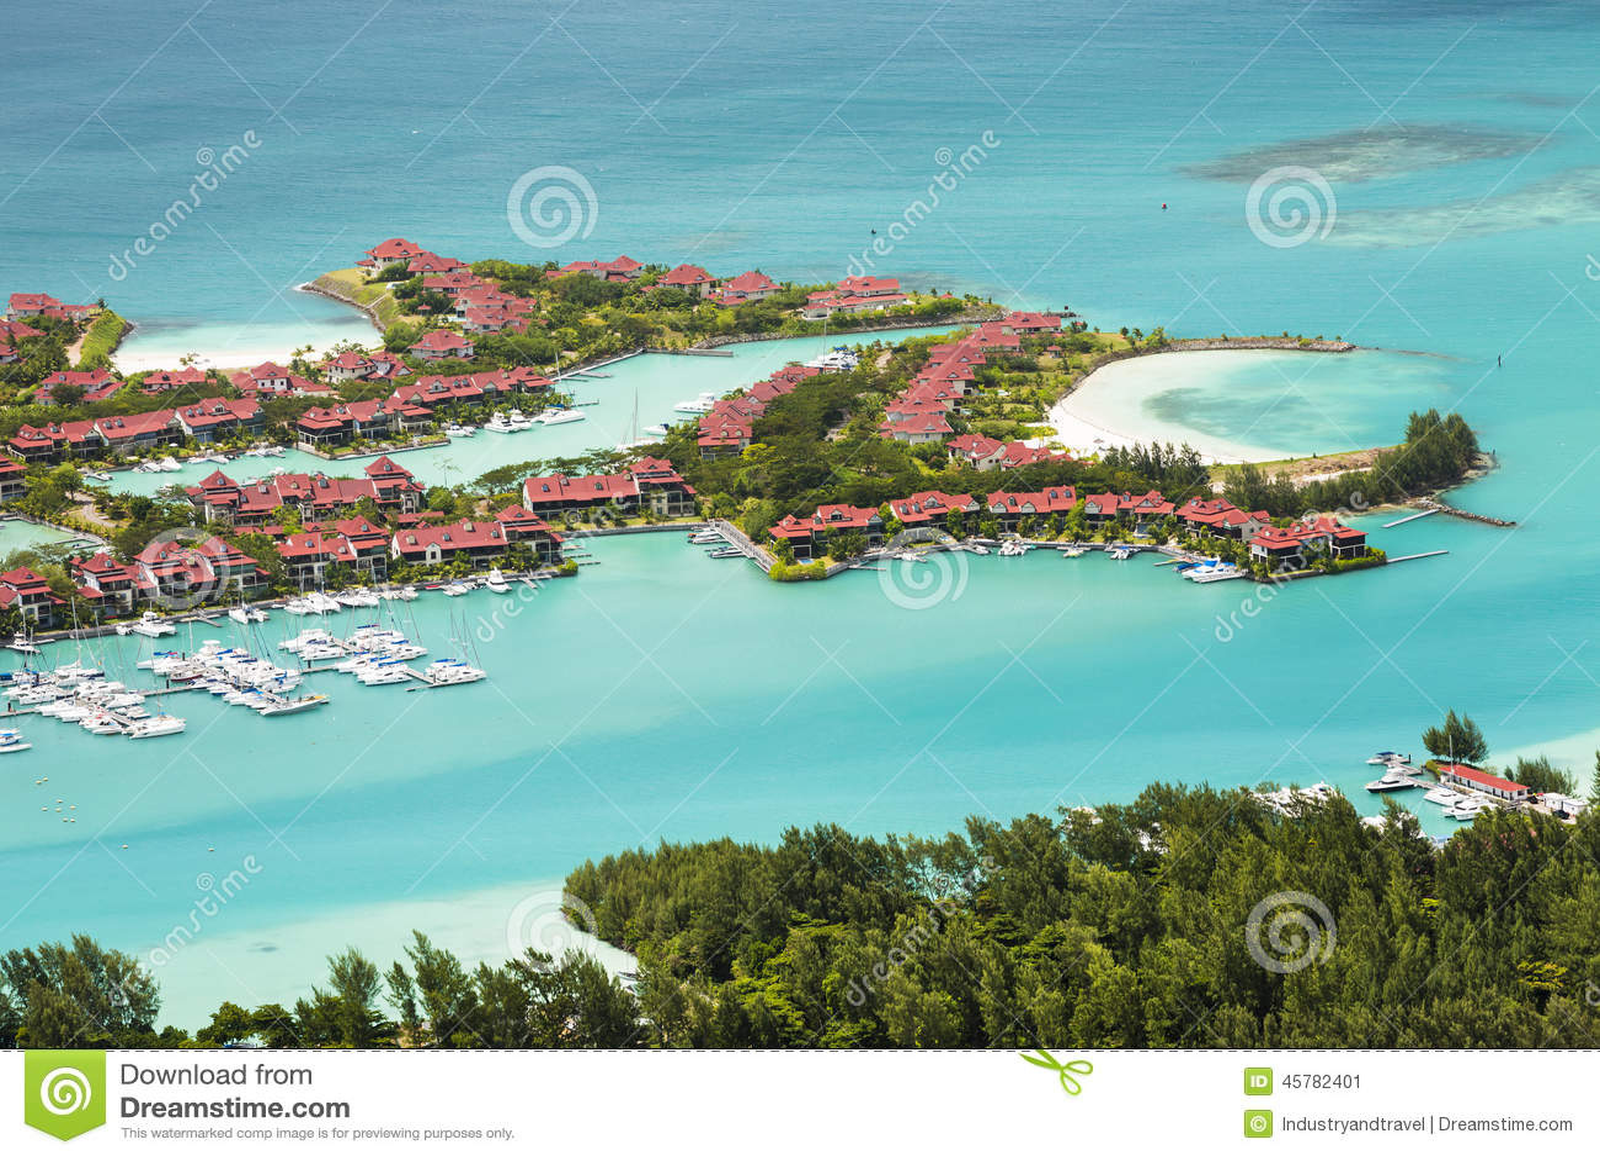 Eden island mahe seychelles stock photo image 45782401 - Eden island seychelles ...